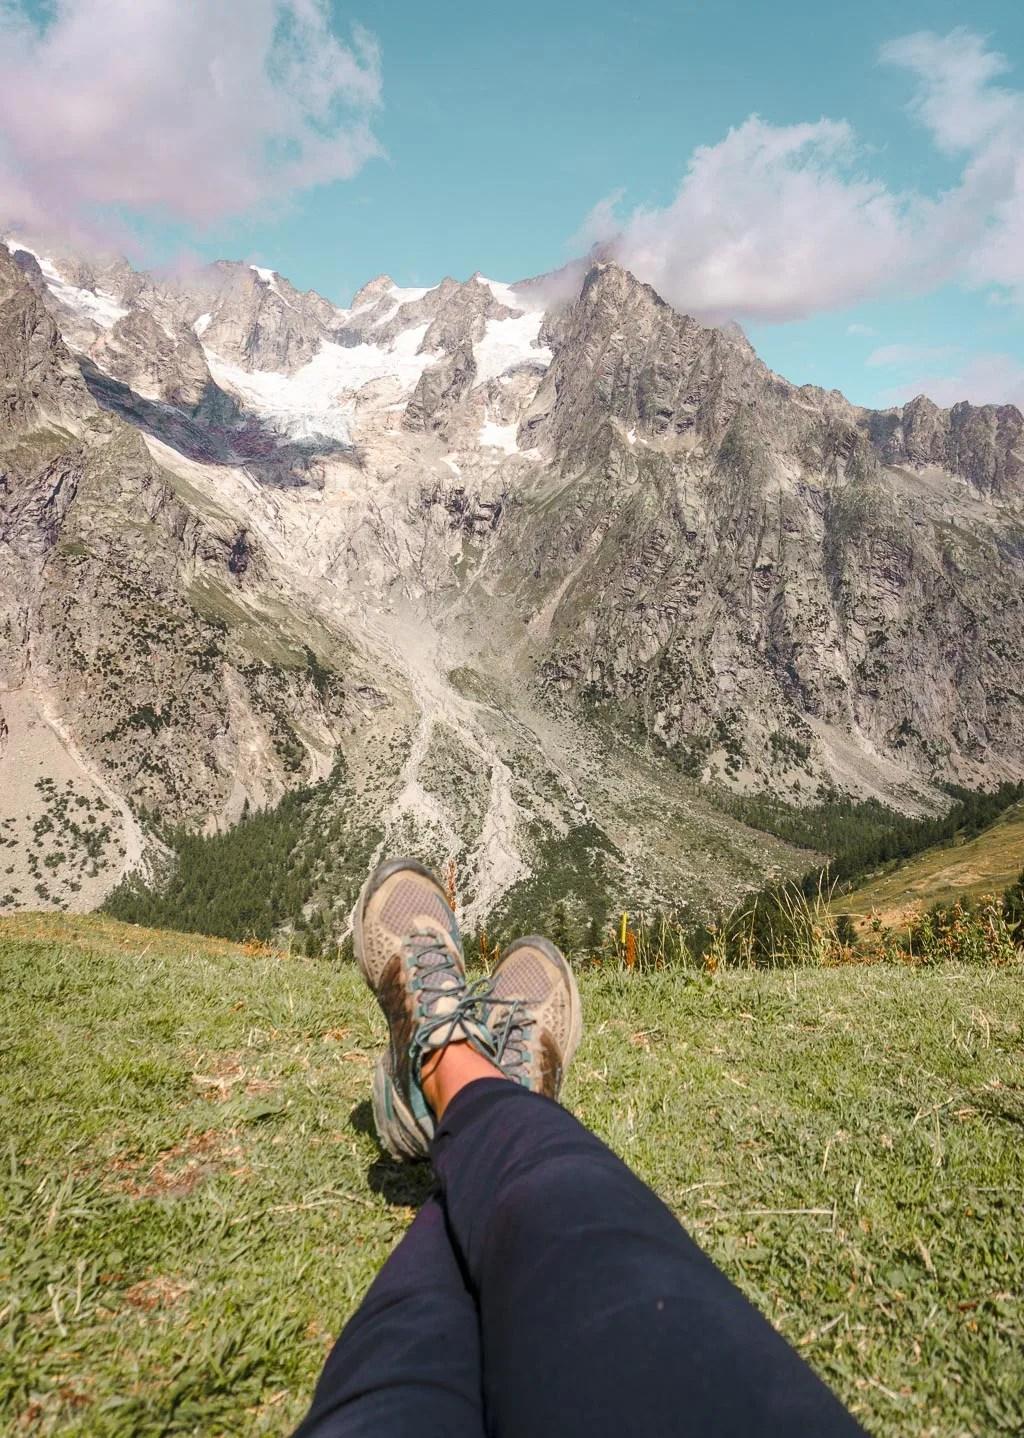 Rifugio Bonatti on Tour du Mont Blanc, Italy